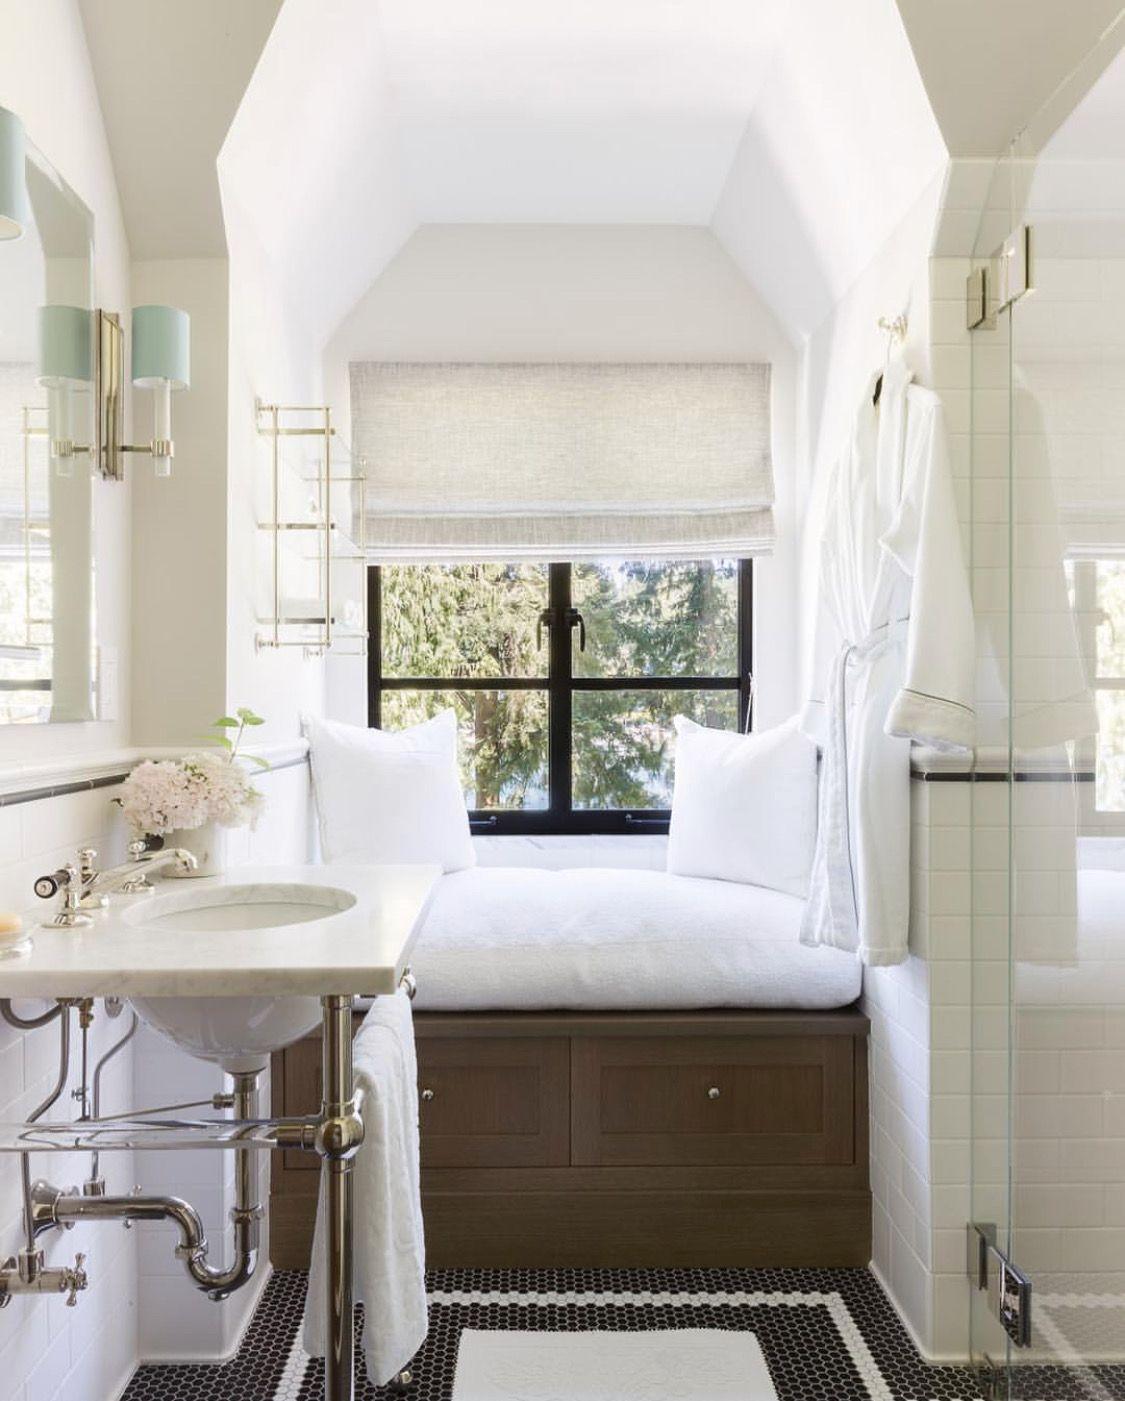 Pin by Peden Wright on Interiors. | Pinterest | Bath, Powder room ...